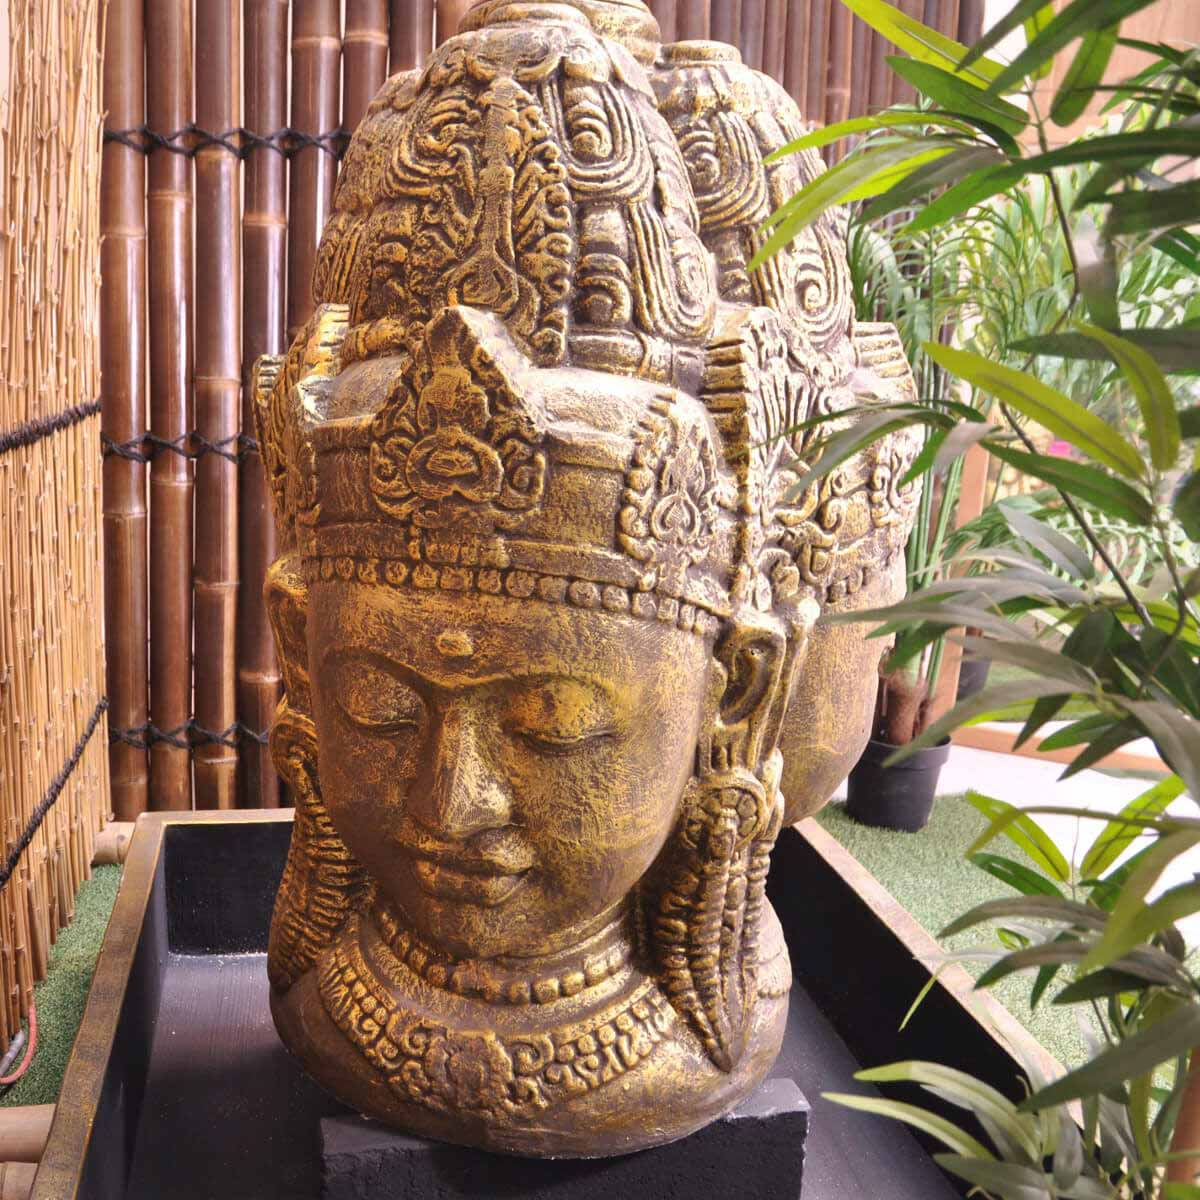 Fontaine de jardin fontaine avec bassin visage de déesse Dewi